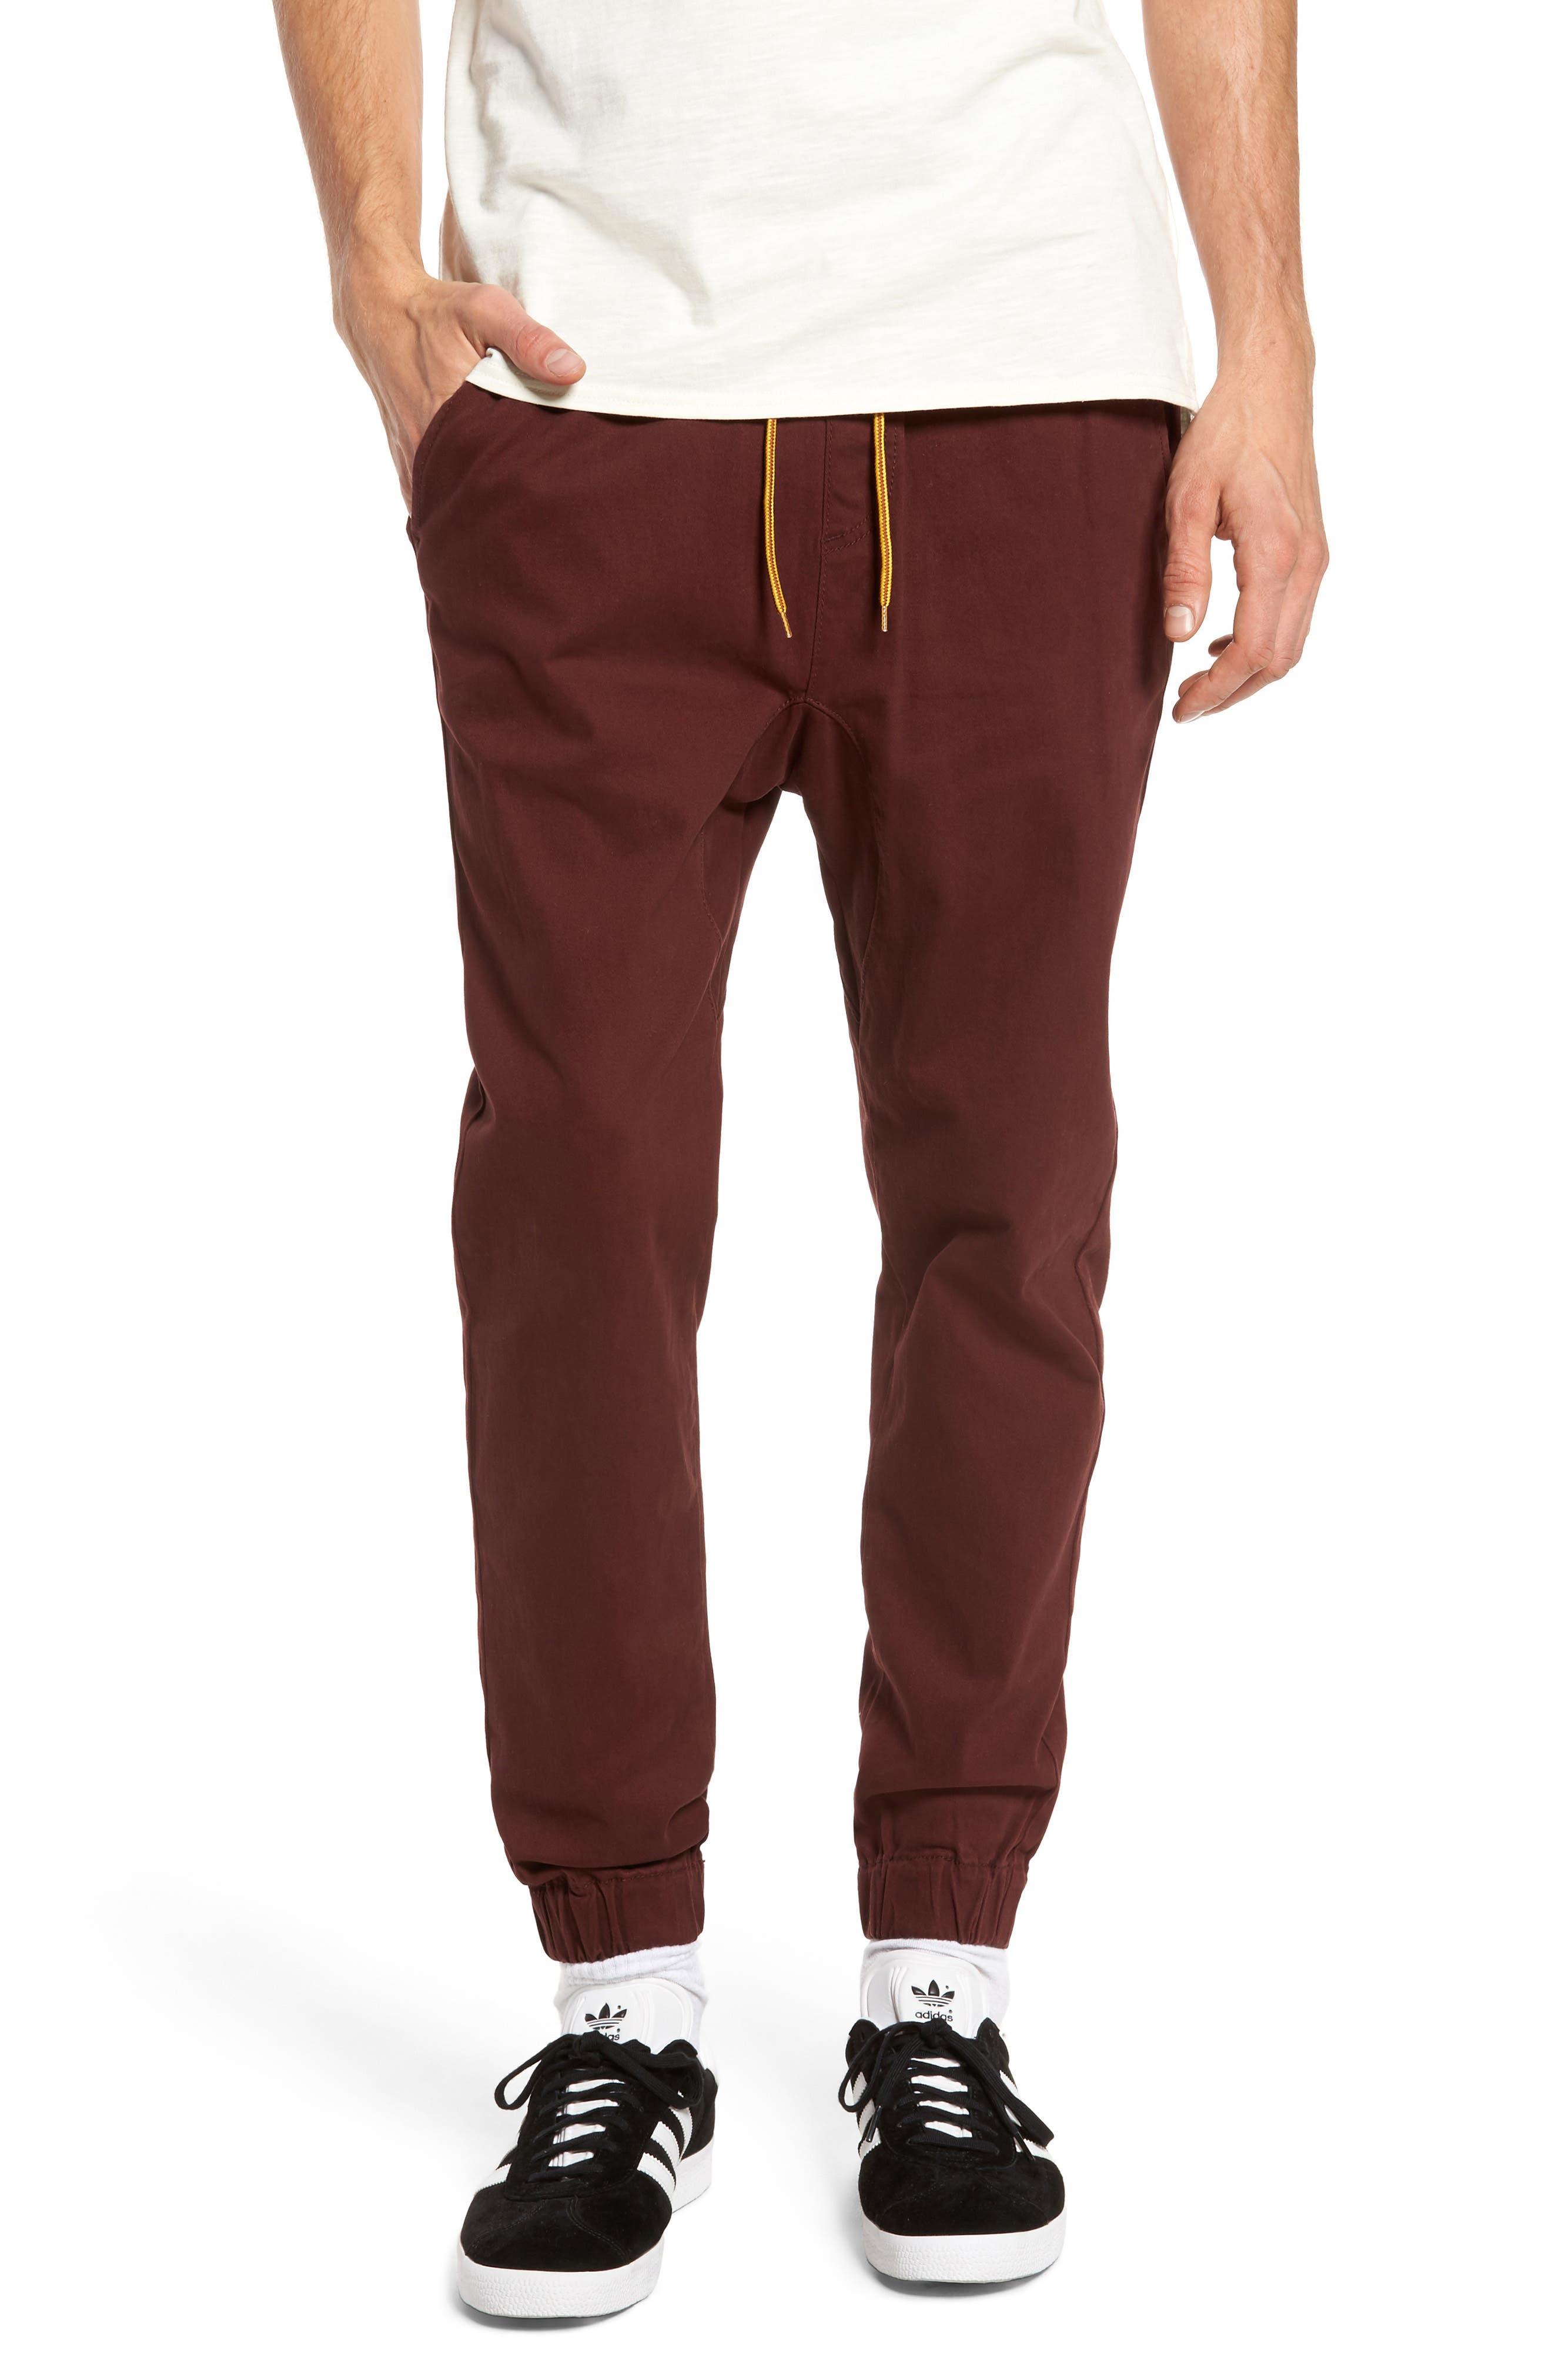 Alternate Image 1 Selected - Lira Clothing Weekend Jogger Pants